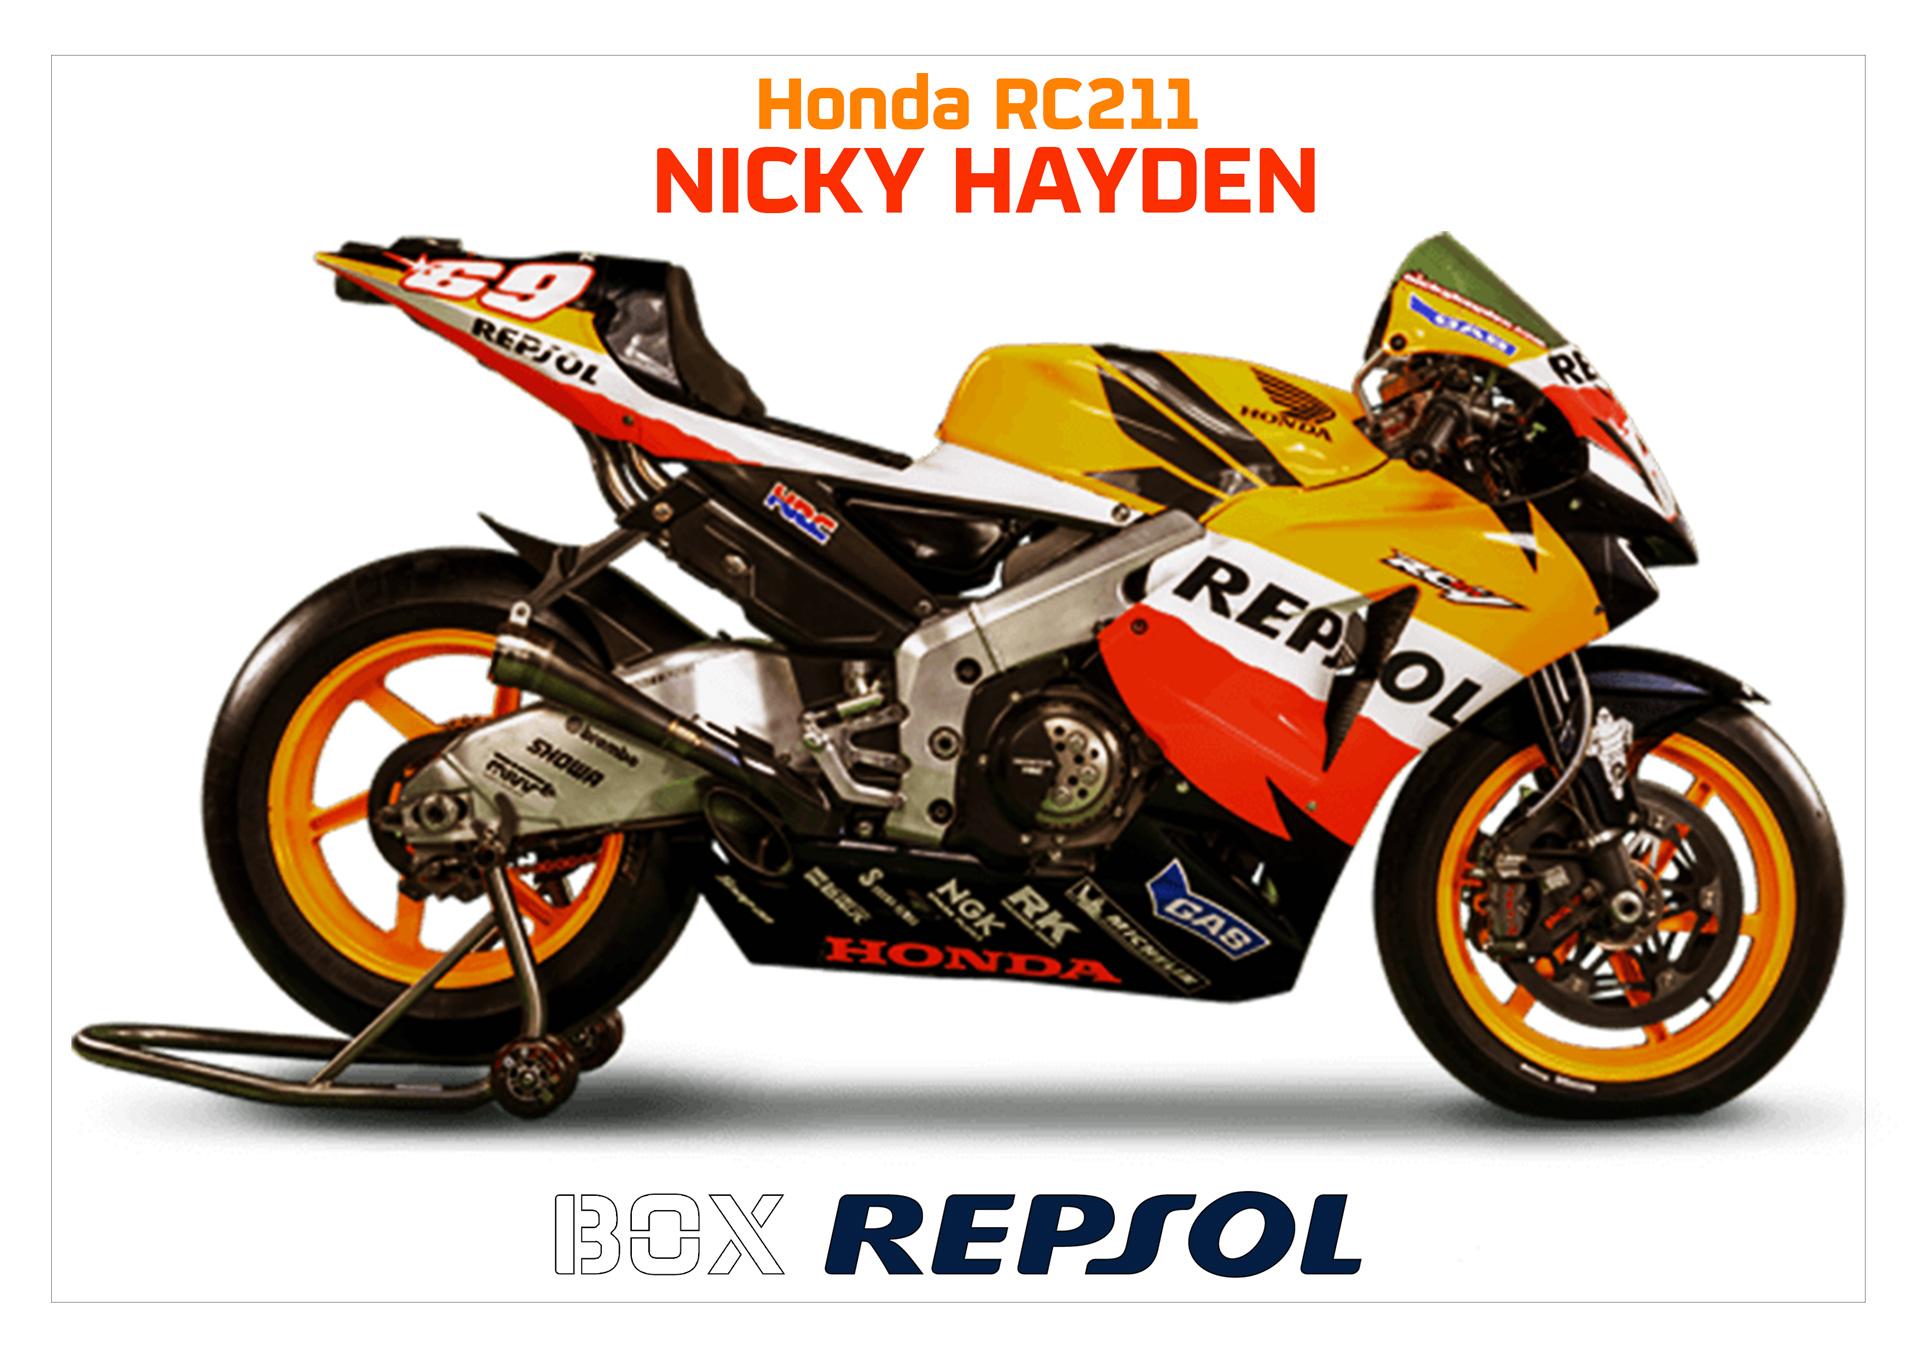 Honda RC211V. Nicky Hayden